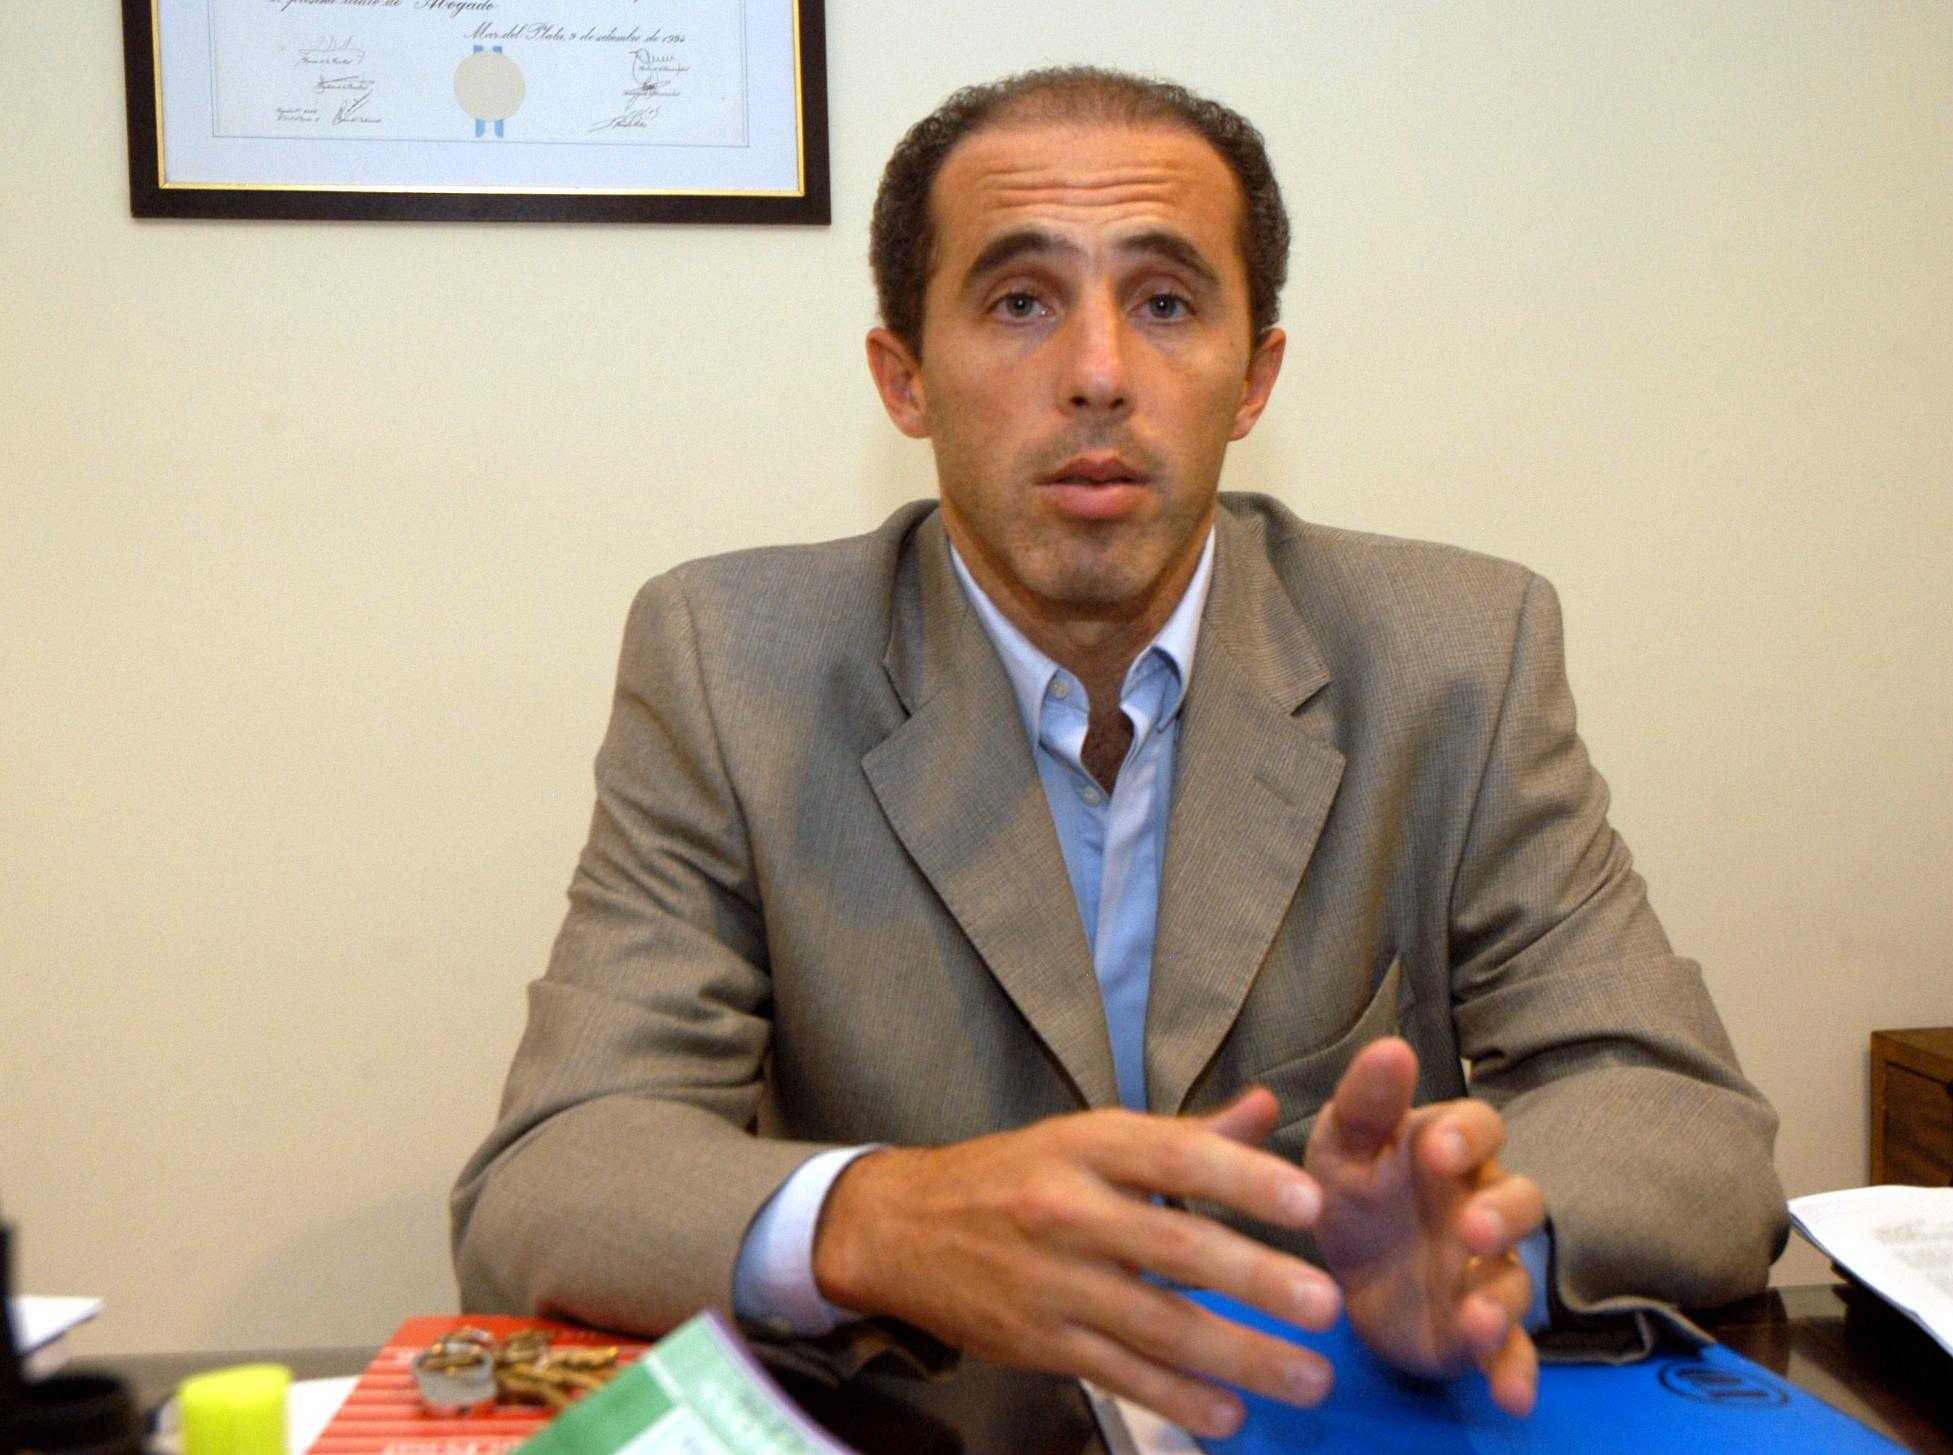 El fiscal Juan Manuiel Pettigiani, quien presentó la denuncia que puso la lupa sobre la iniciaiva de las fotomultas.